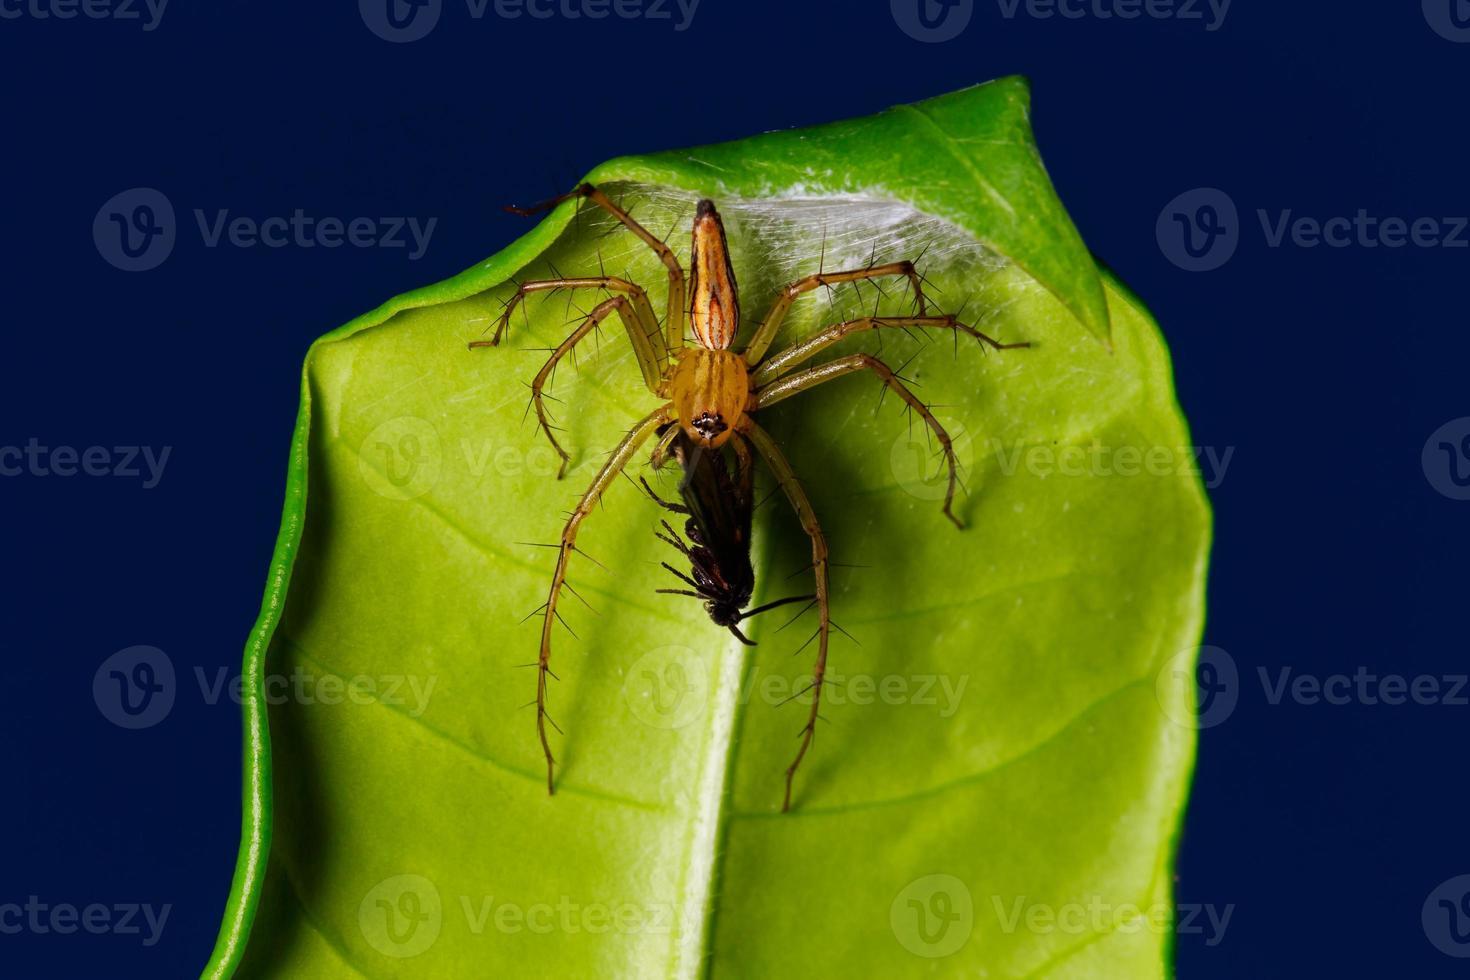 Spinne frisst Käfer auf dem Blatt foto